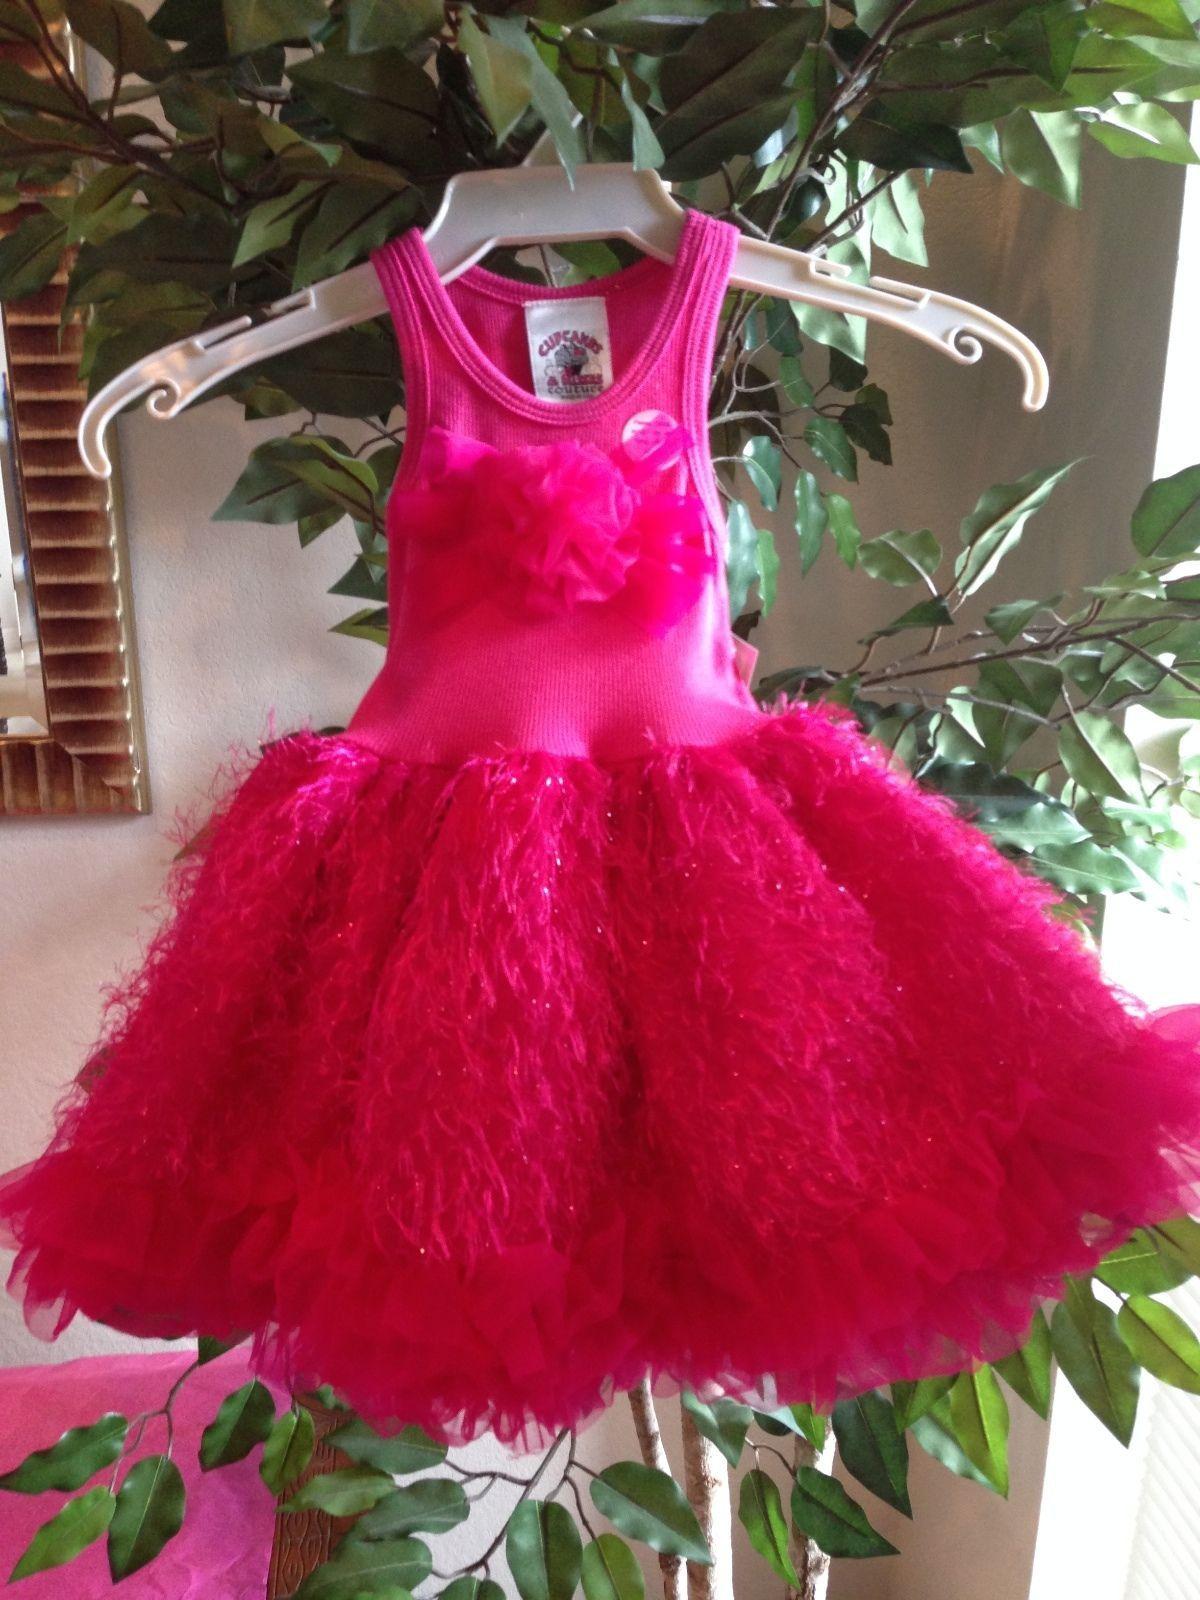 Posh Sparkly Fuchsia Eyelash Chiffon Pink Tutu Dress, 6M-5/6 USA Cupcakes Kisses